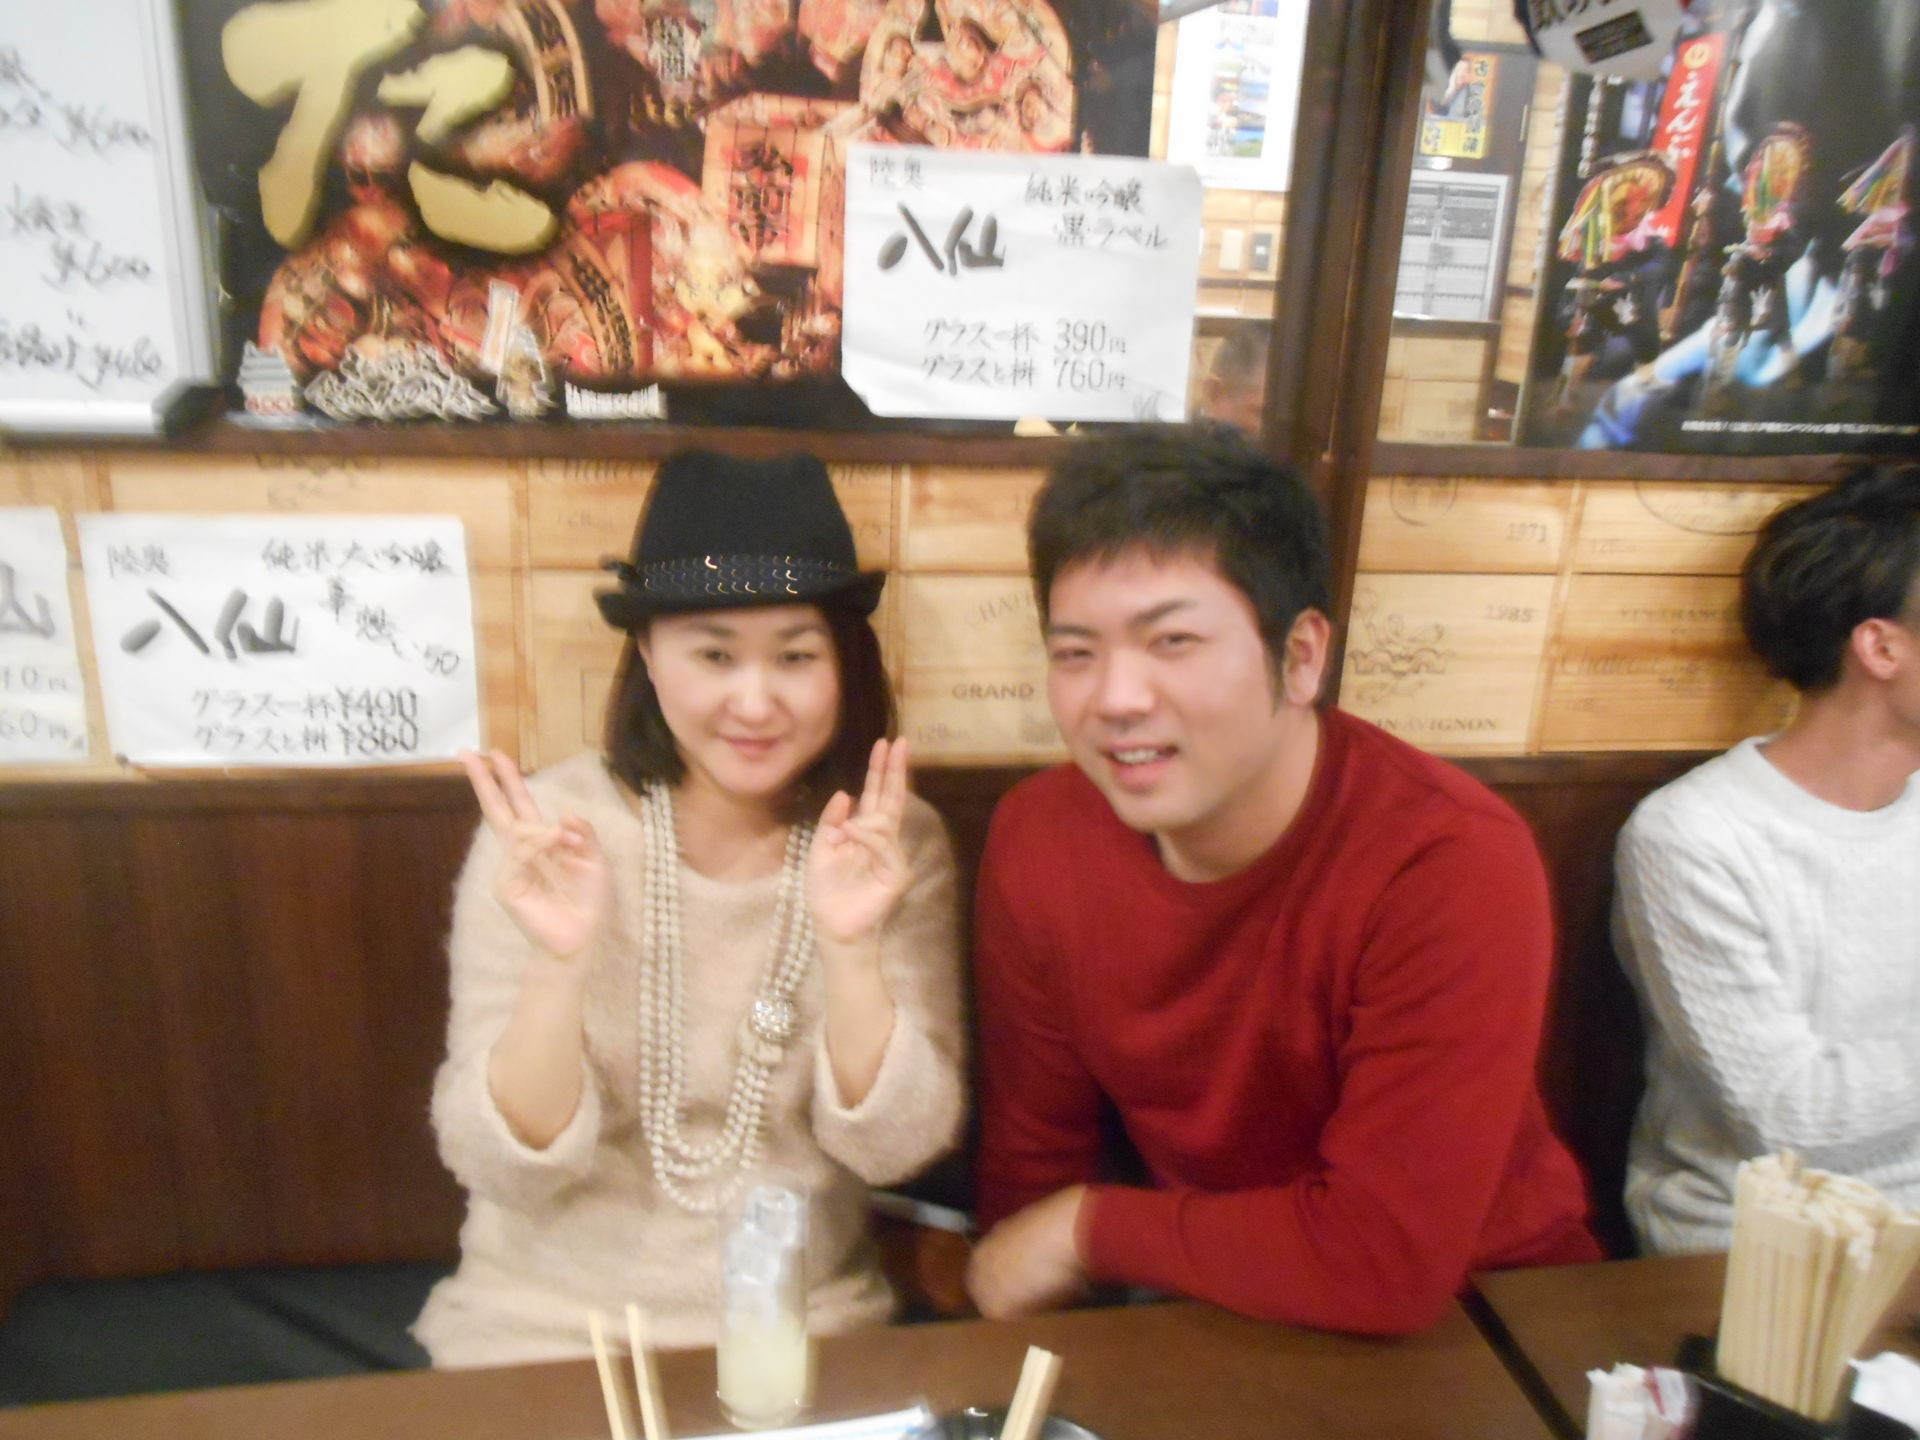 DSCN0614 1920x1440 - 2015年12月21日(月) AOsuki忘年会開催しました。